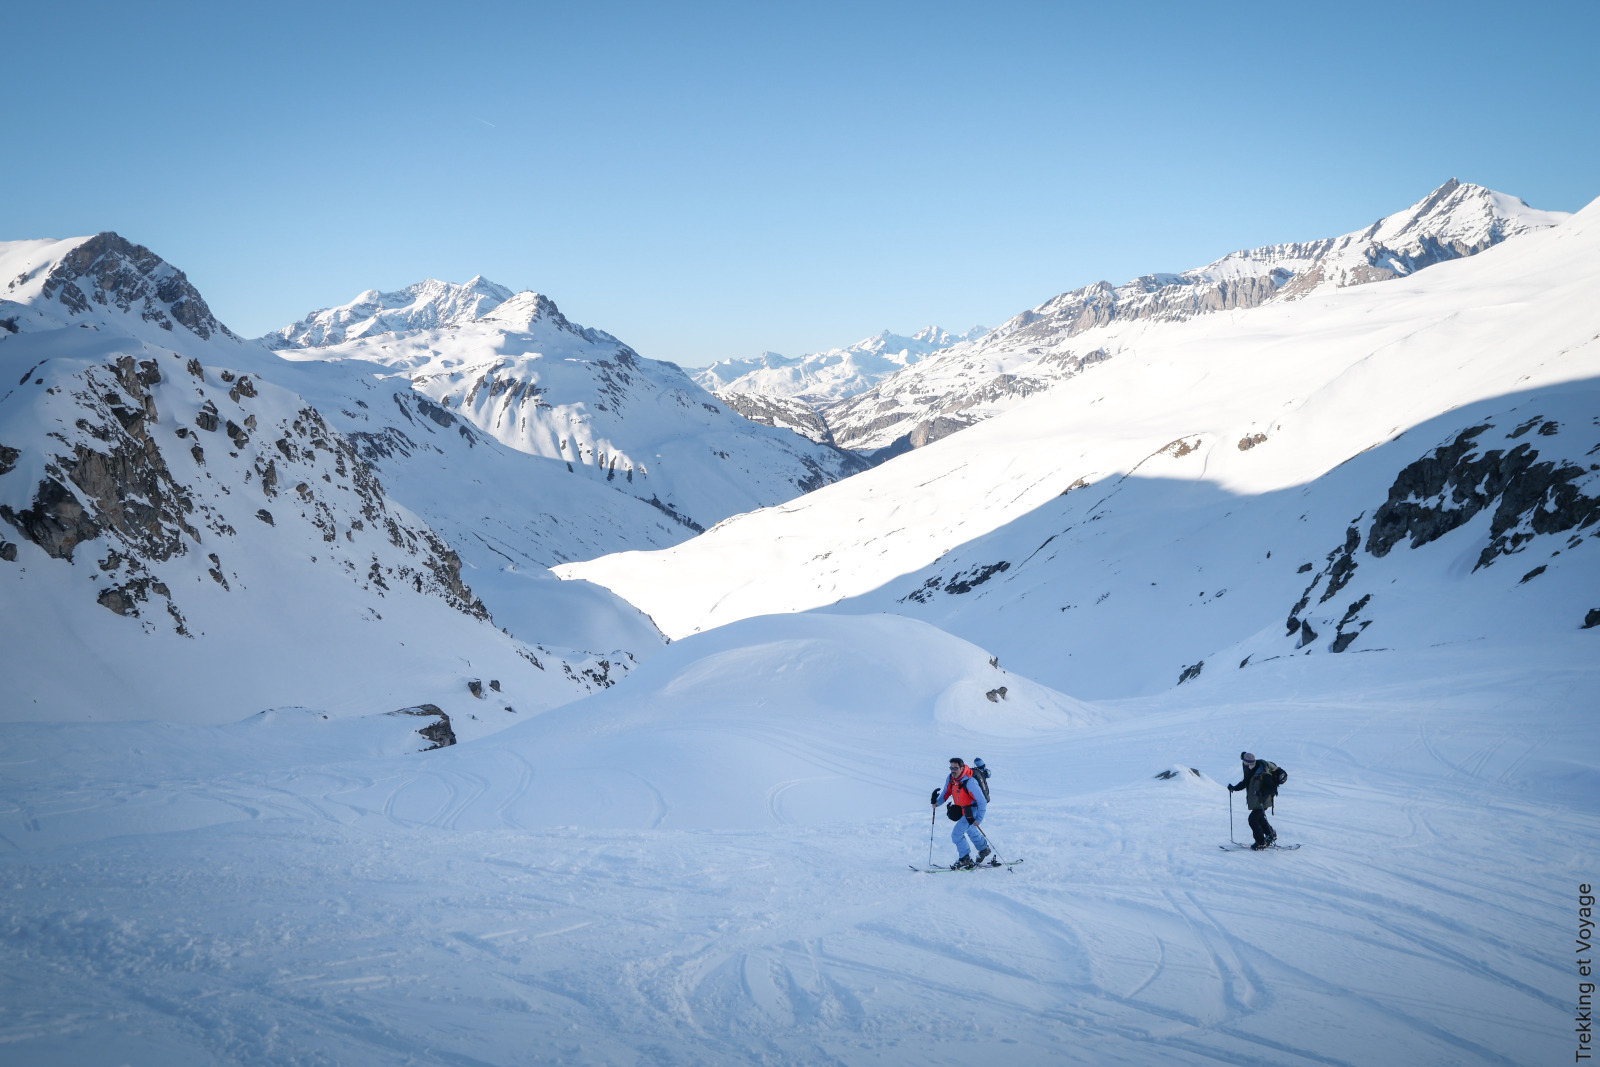 Ski Touring with Oxygene - Trekking et Voyages - Val d'Isère Tourisme